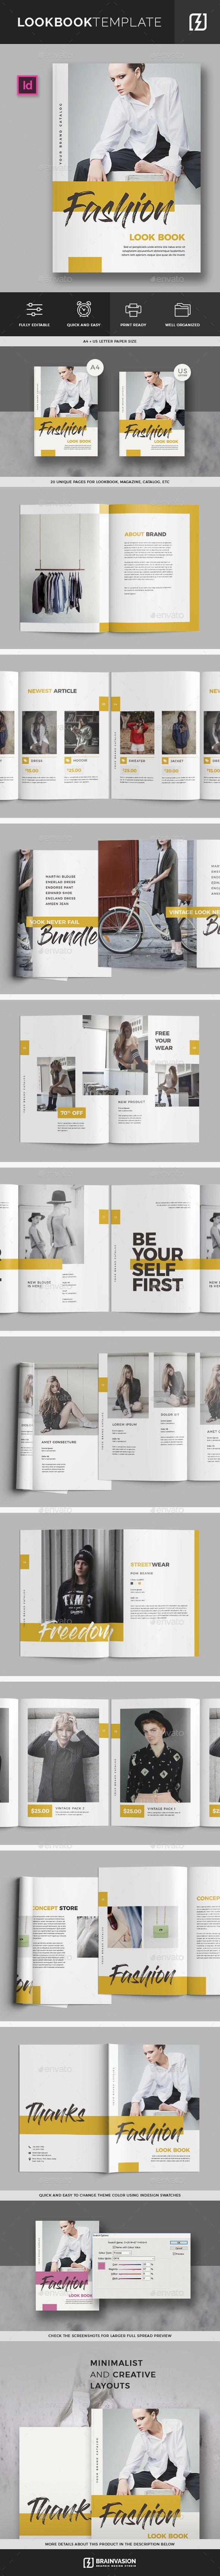 Lookbook Fashion Magazine Template InDesign INDD